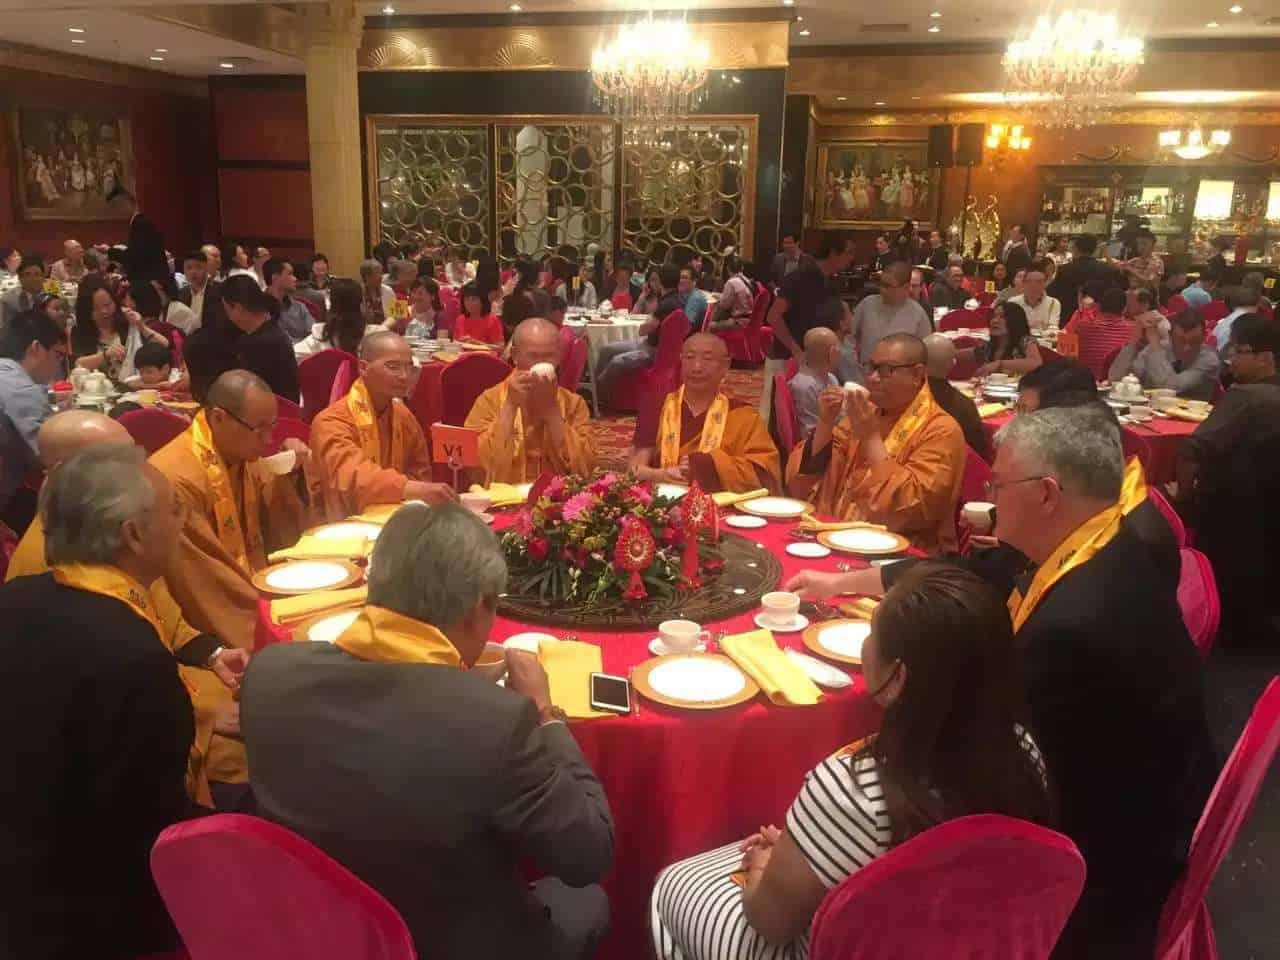 gosok-rinpoche-toronto-2016-4c3880357f06026a7396cf16f4d0b65